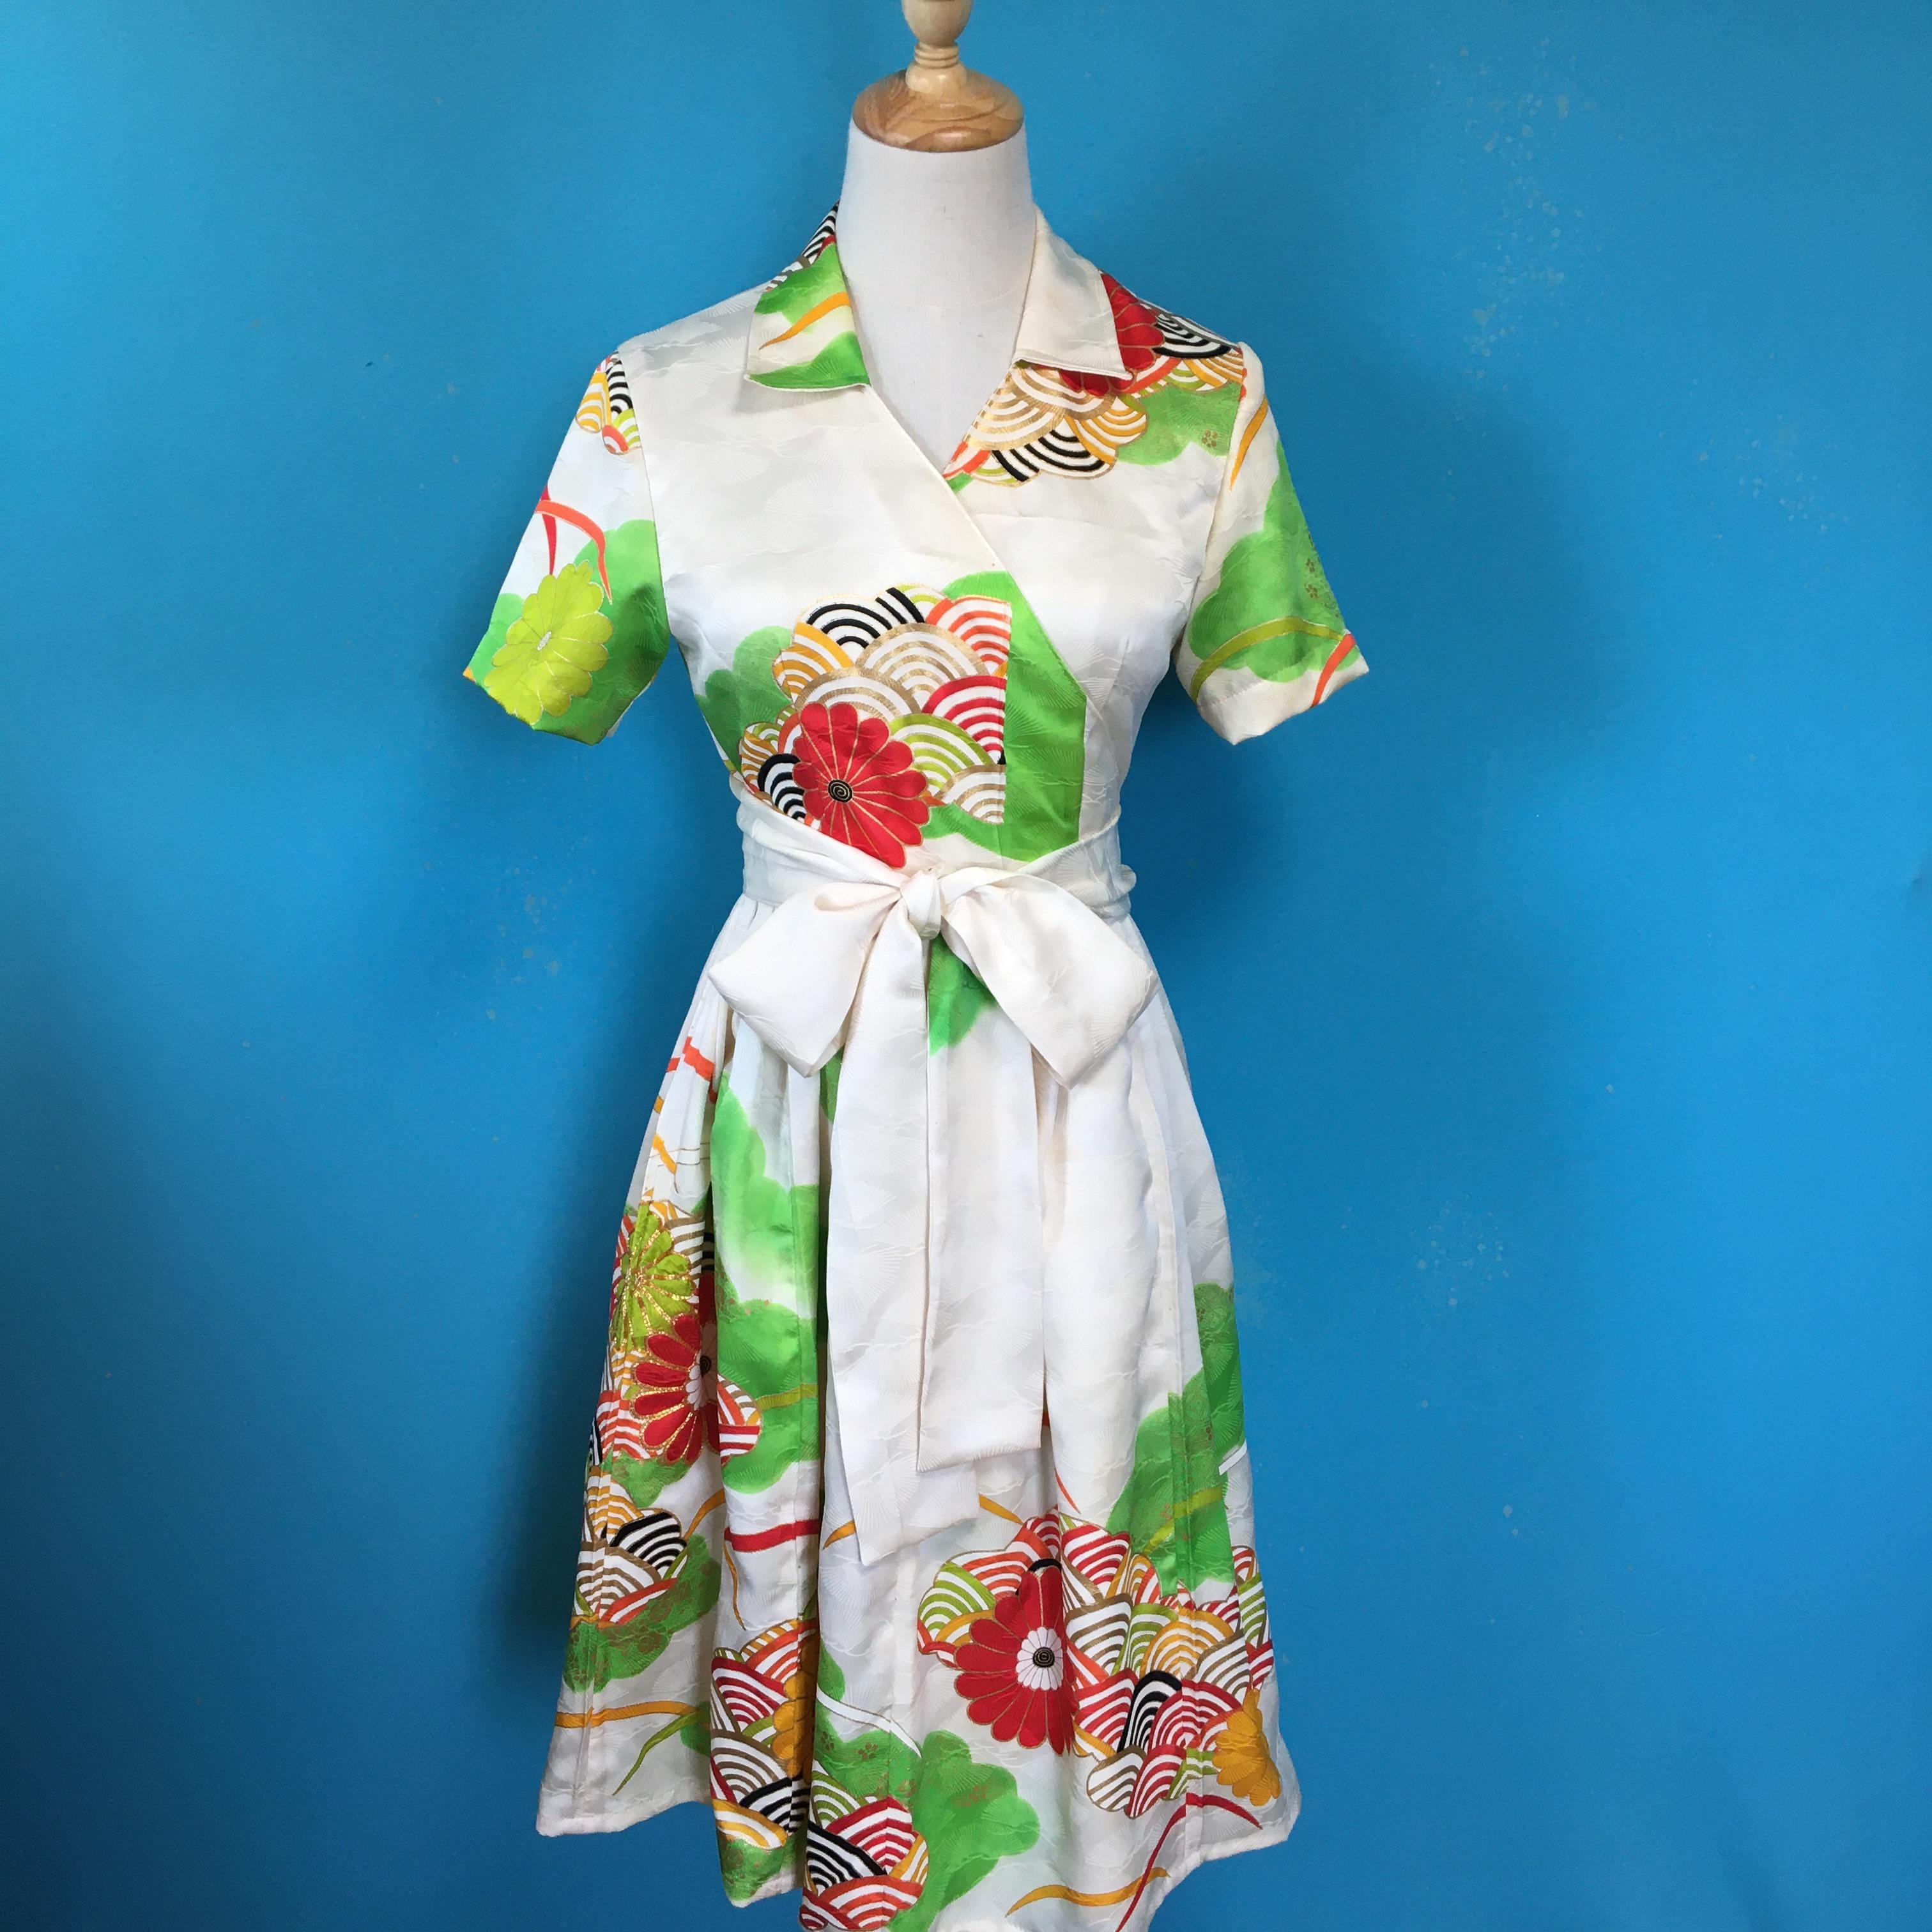 振袖 Vintage kimono wrap dress/ US 6